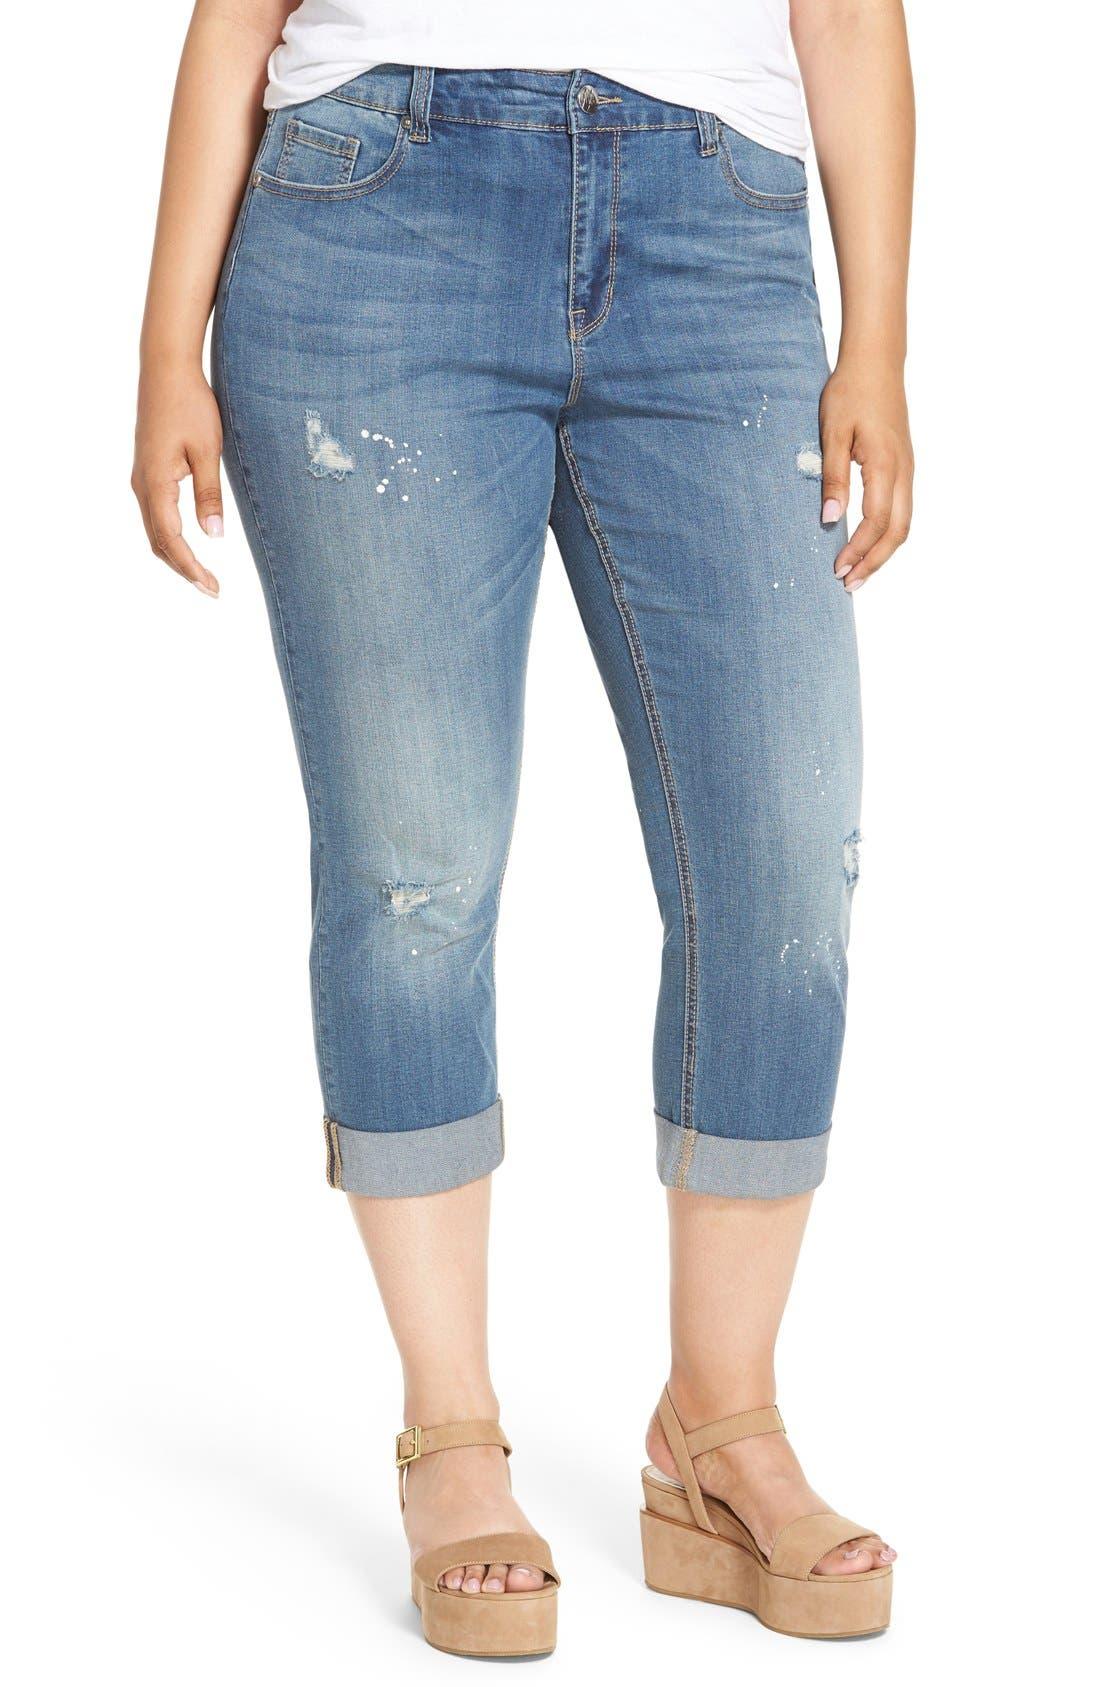 MELISSA MCCARTHY SEVEN7 Stretch Crop Girlfriend Jeans